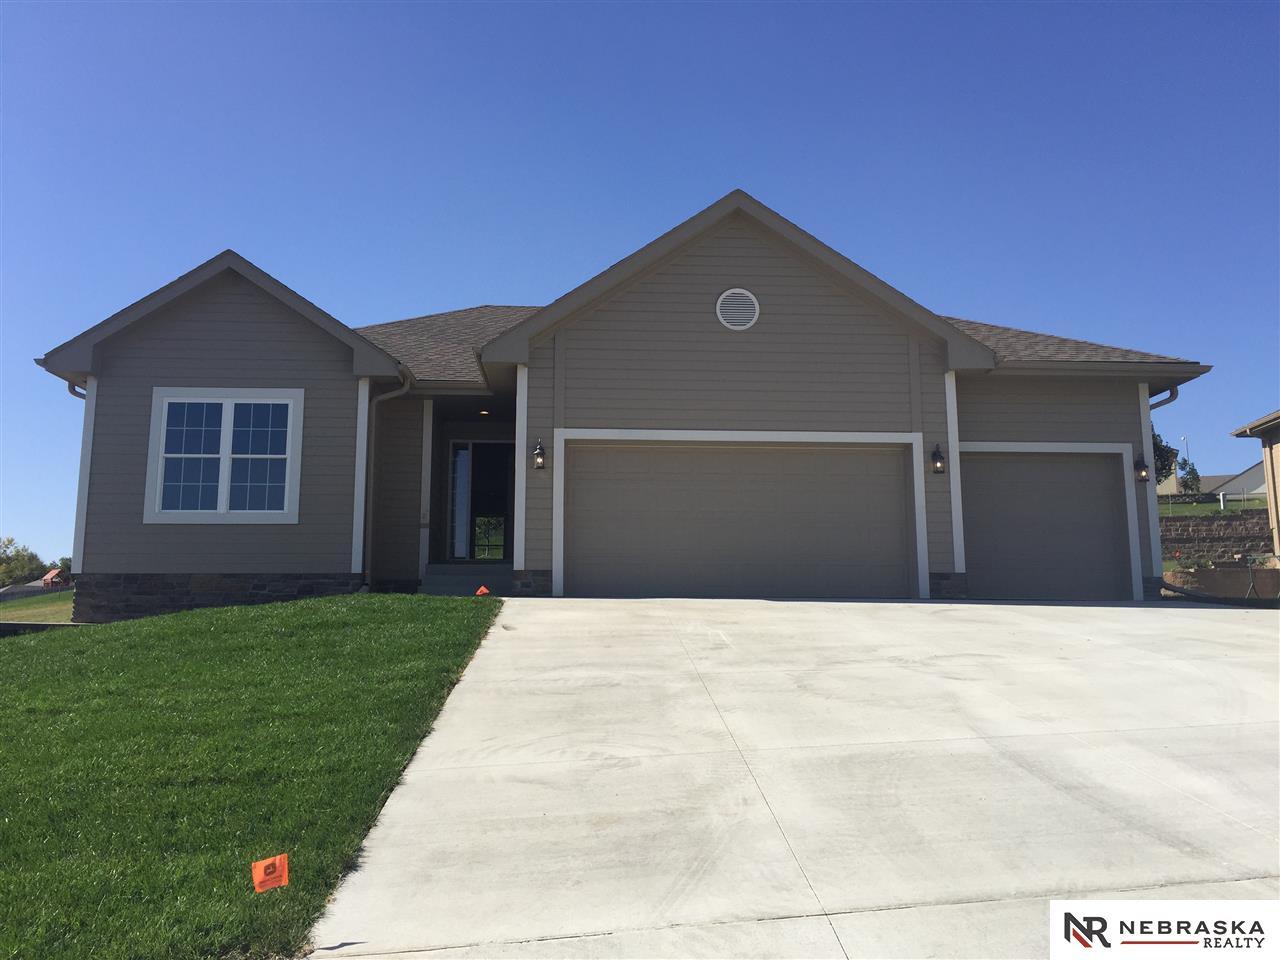 Real Estate for Sale, ListingId: 34589490, Ft Calhoun,NE68023